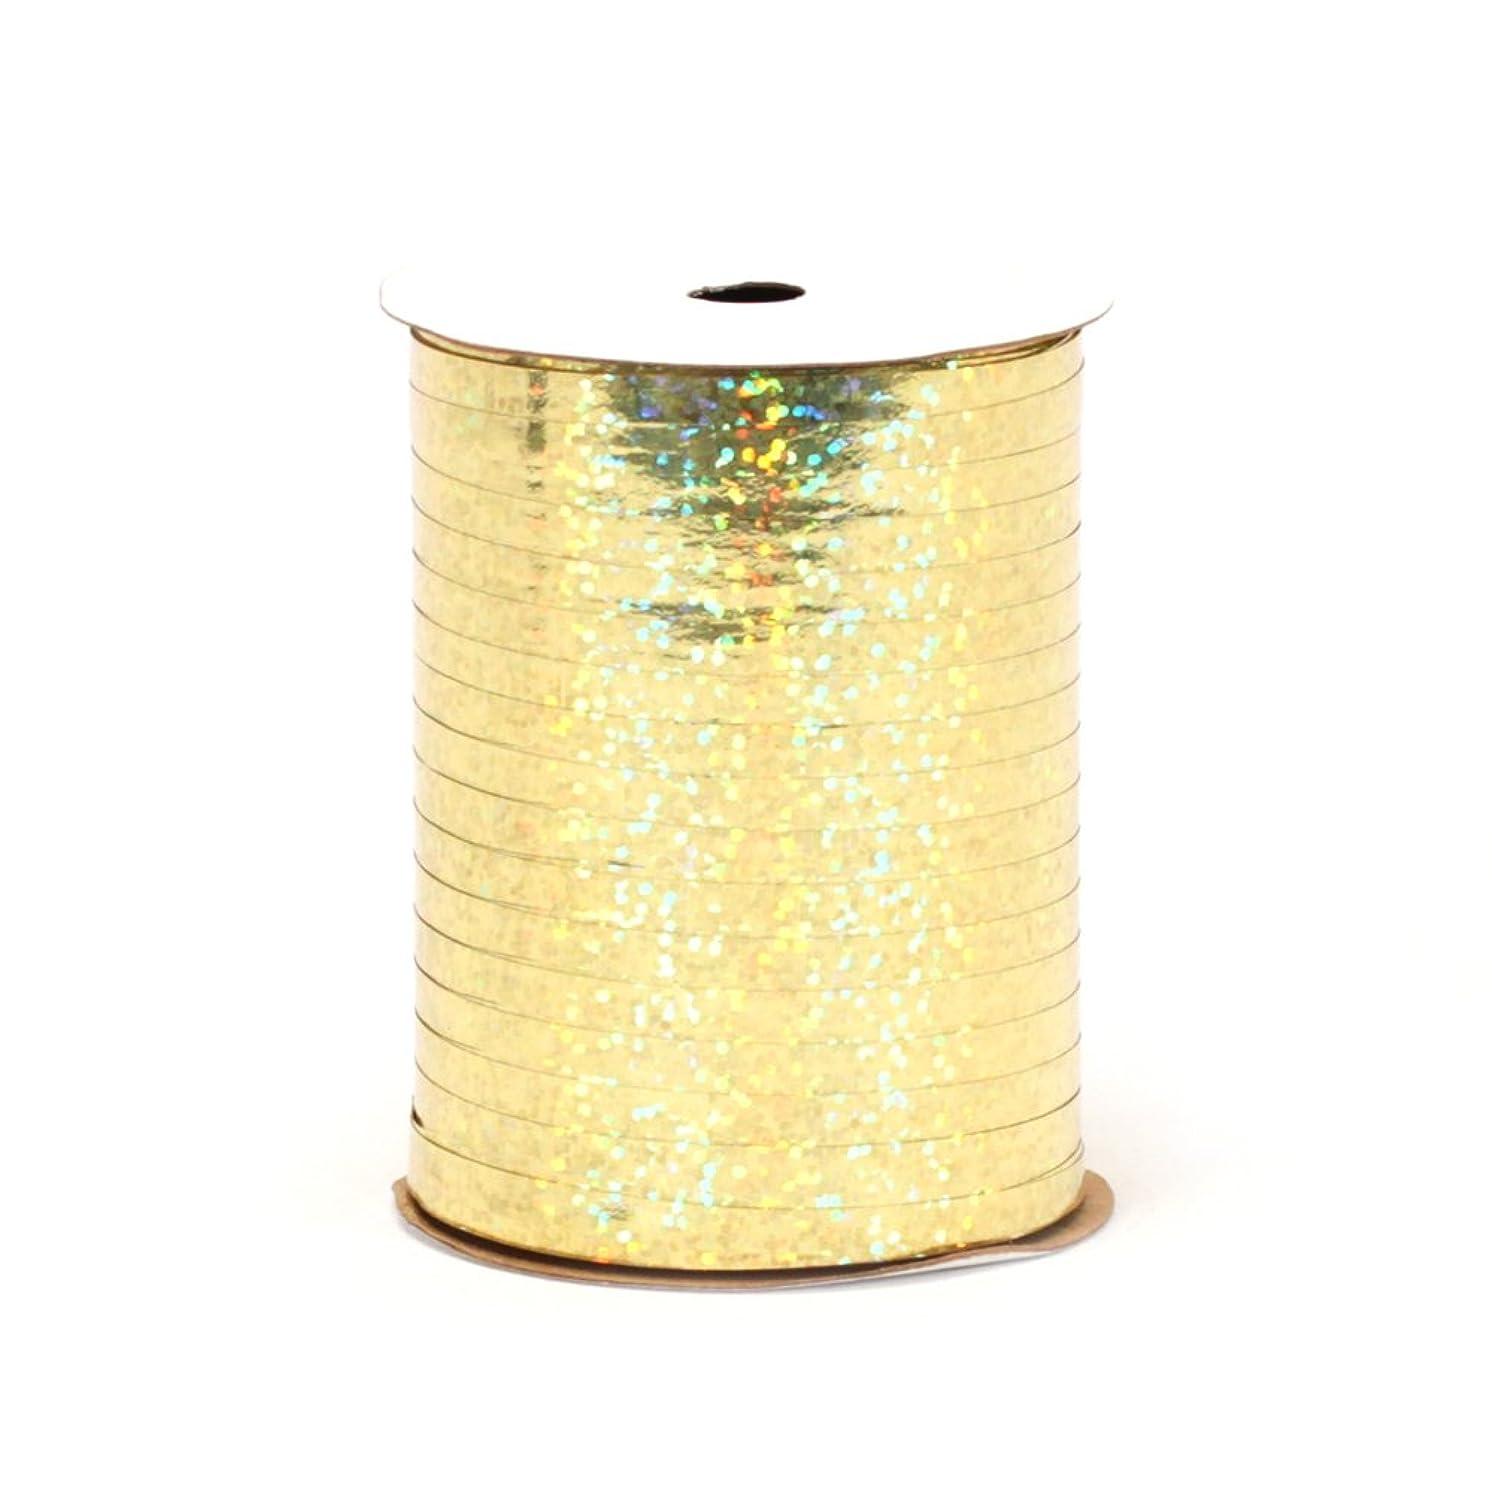 Berwick GL10015 Glitter Uncrimped Curling Ribbon, 3/16-Inch Wide by 100-Yard Spool, Gold